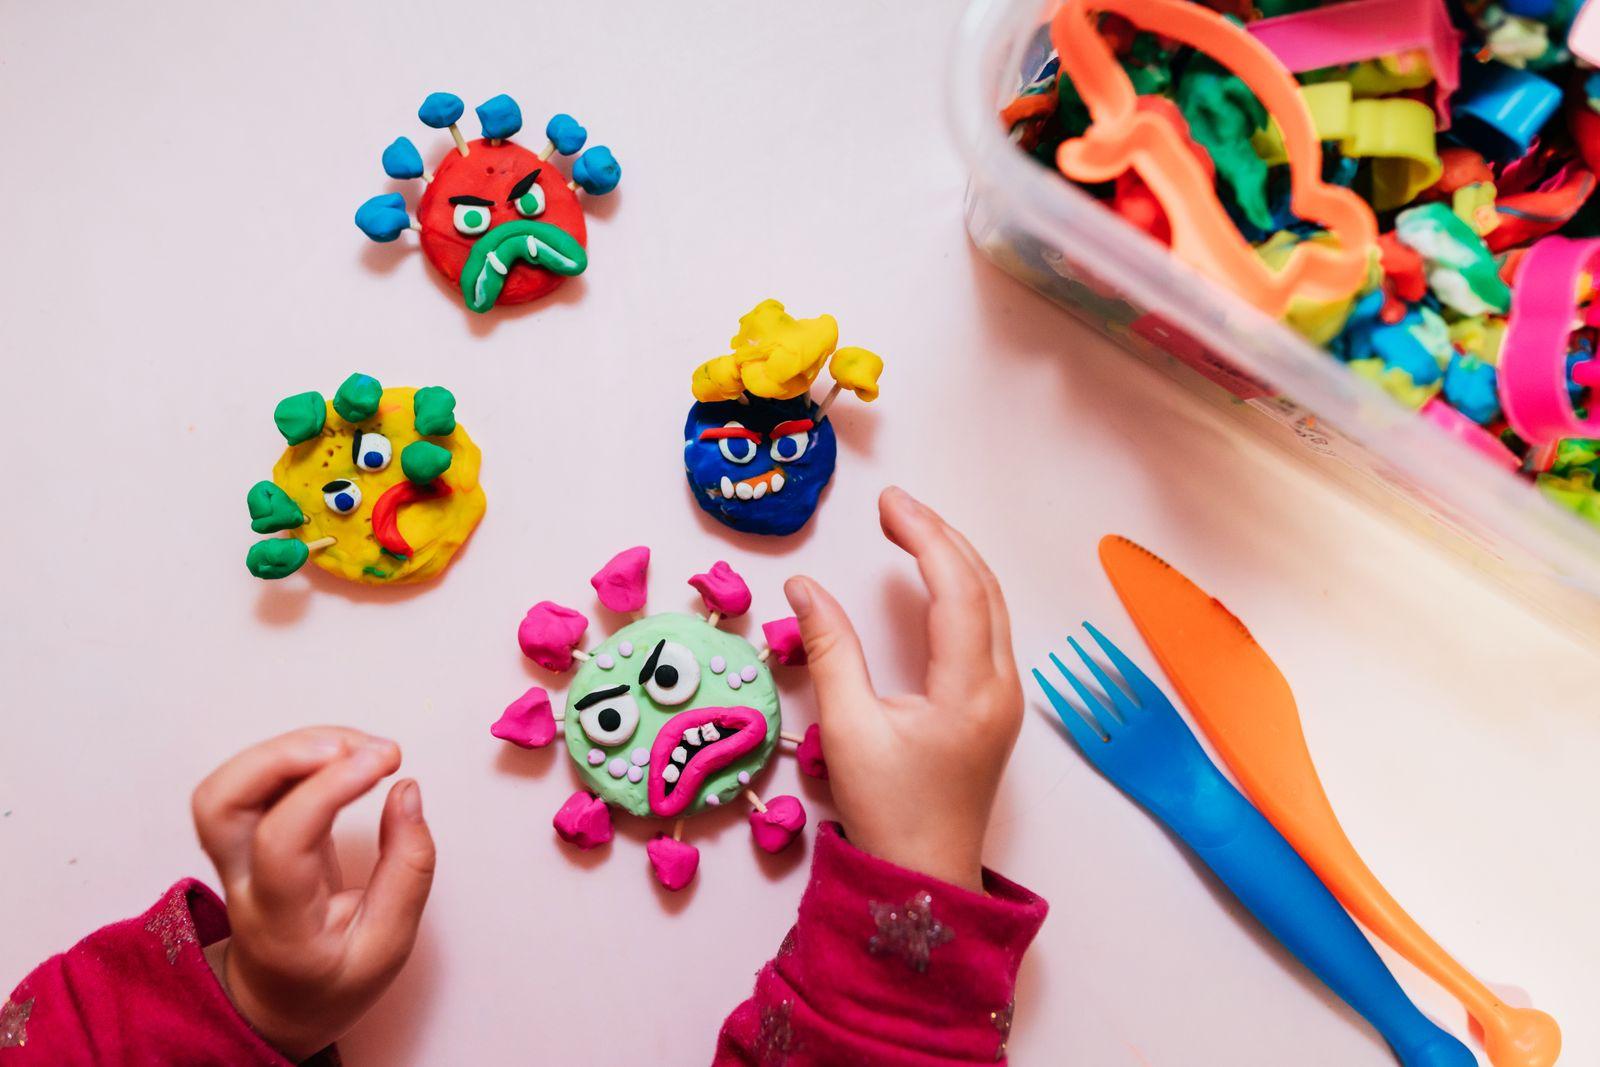 Kid handmade coronavirus ugly monsters made with plasticine